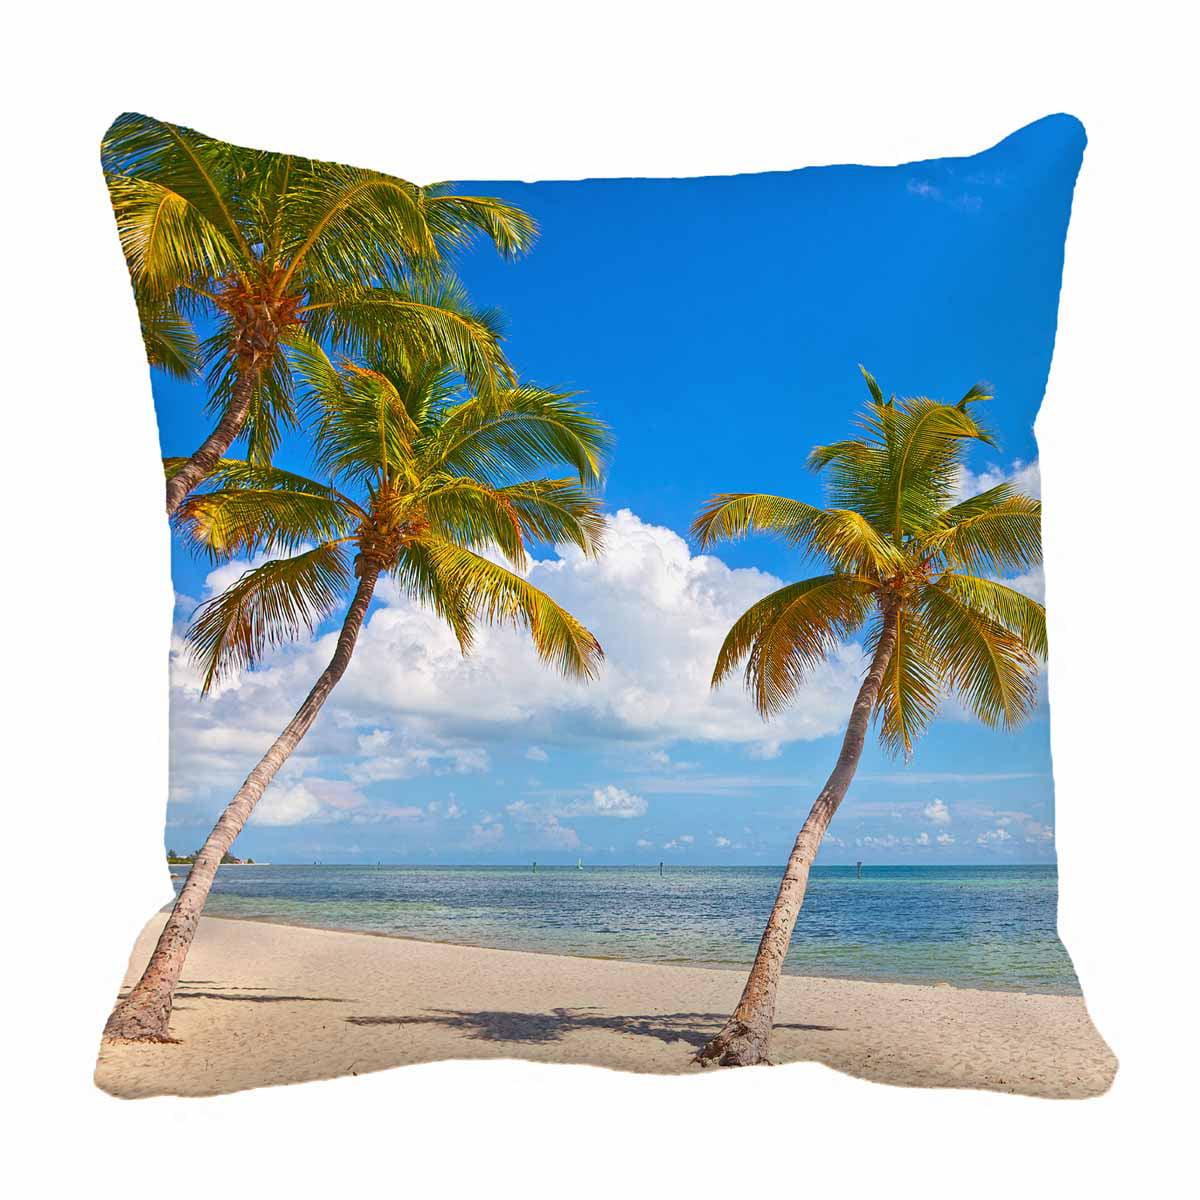 Pkqwtm Palm Trees Beach Key West Blue Sky Ocean Water Florida Bed Decor Pillow Cases Zippered Cushion Cover Size 16x16 Inches Walmart Com Walmart Com